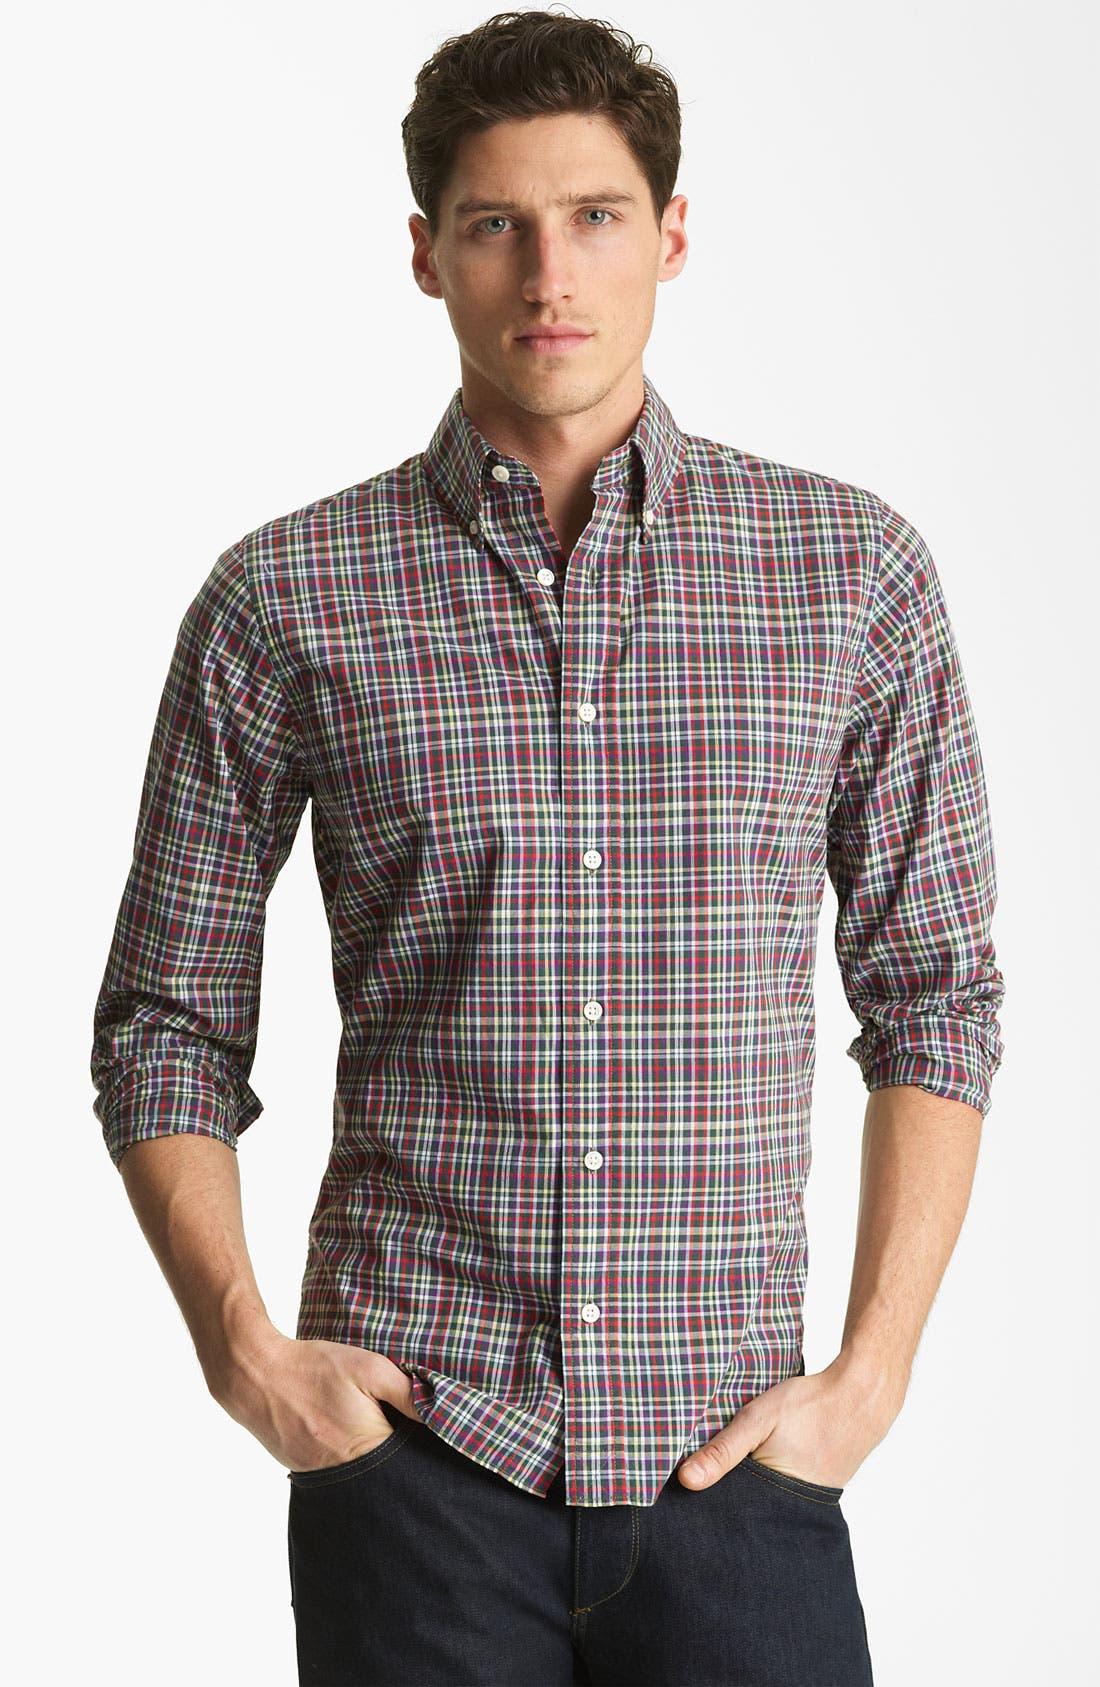 Main Image - Jack Spade 'Epen' Sport Shirt